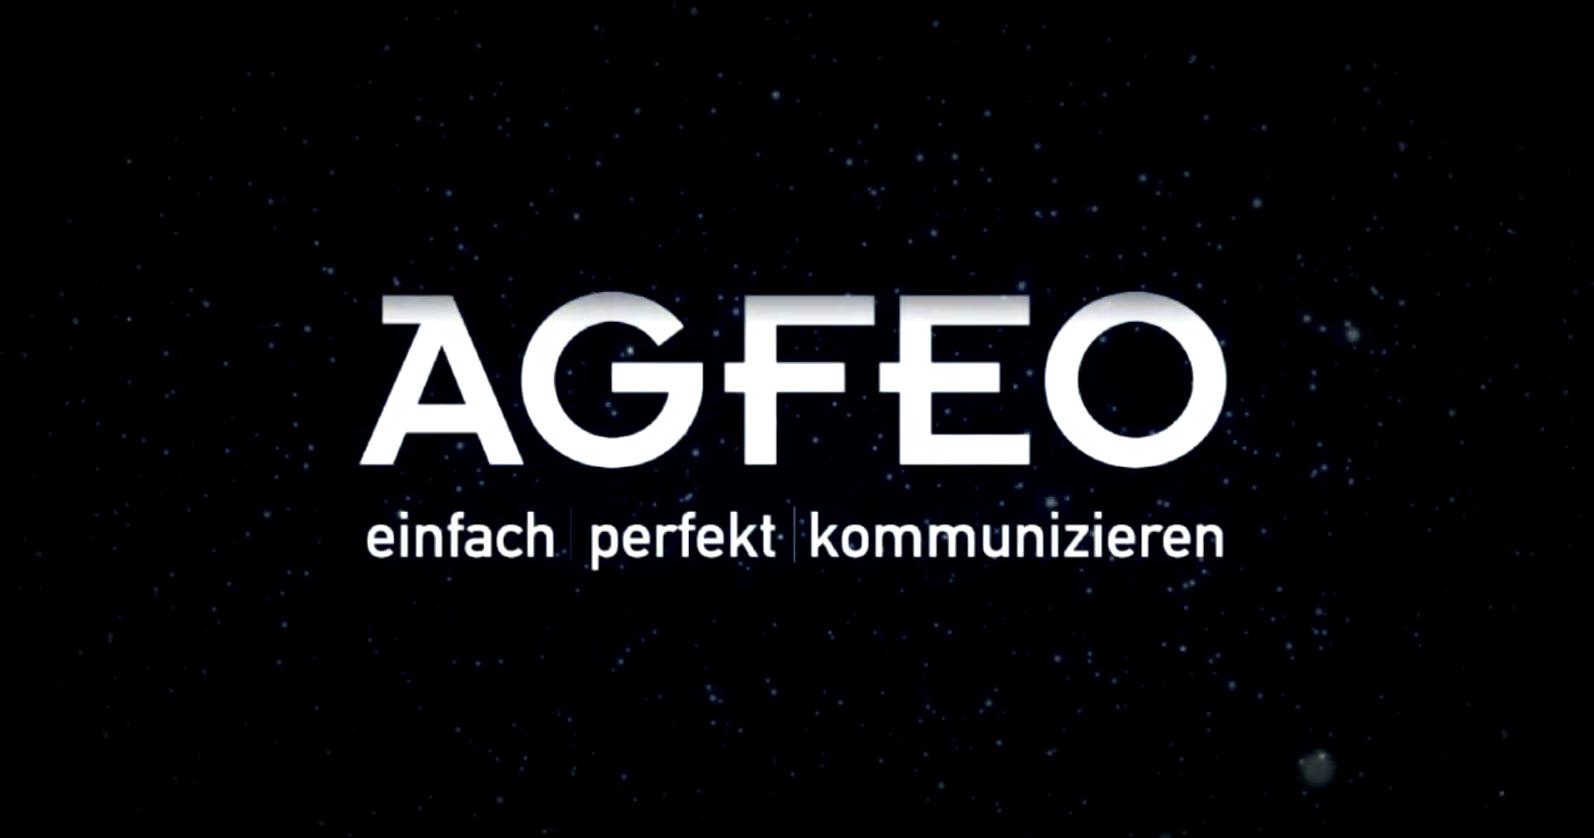 AGFEO_Image